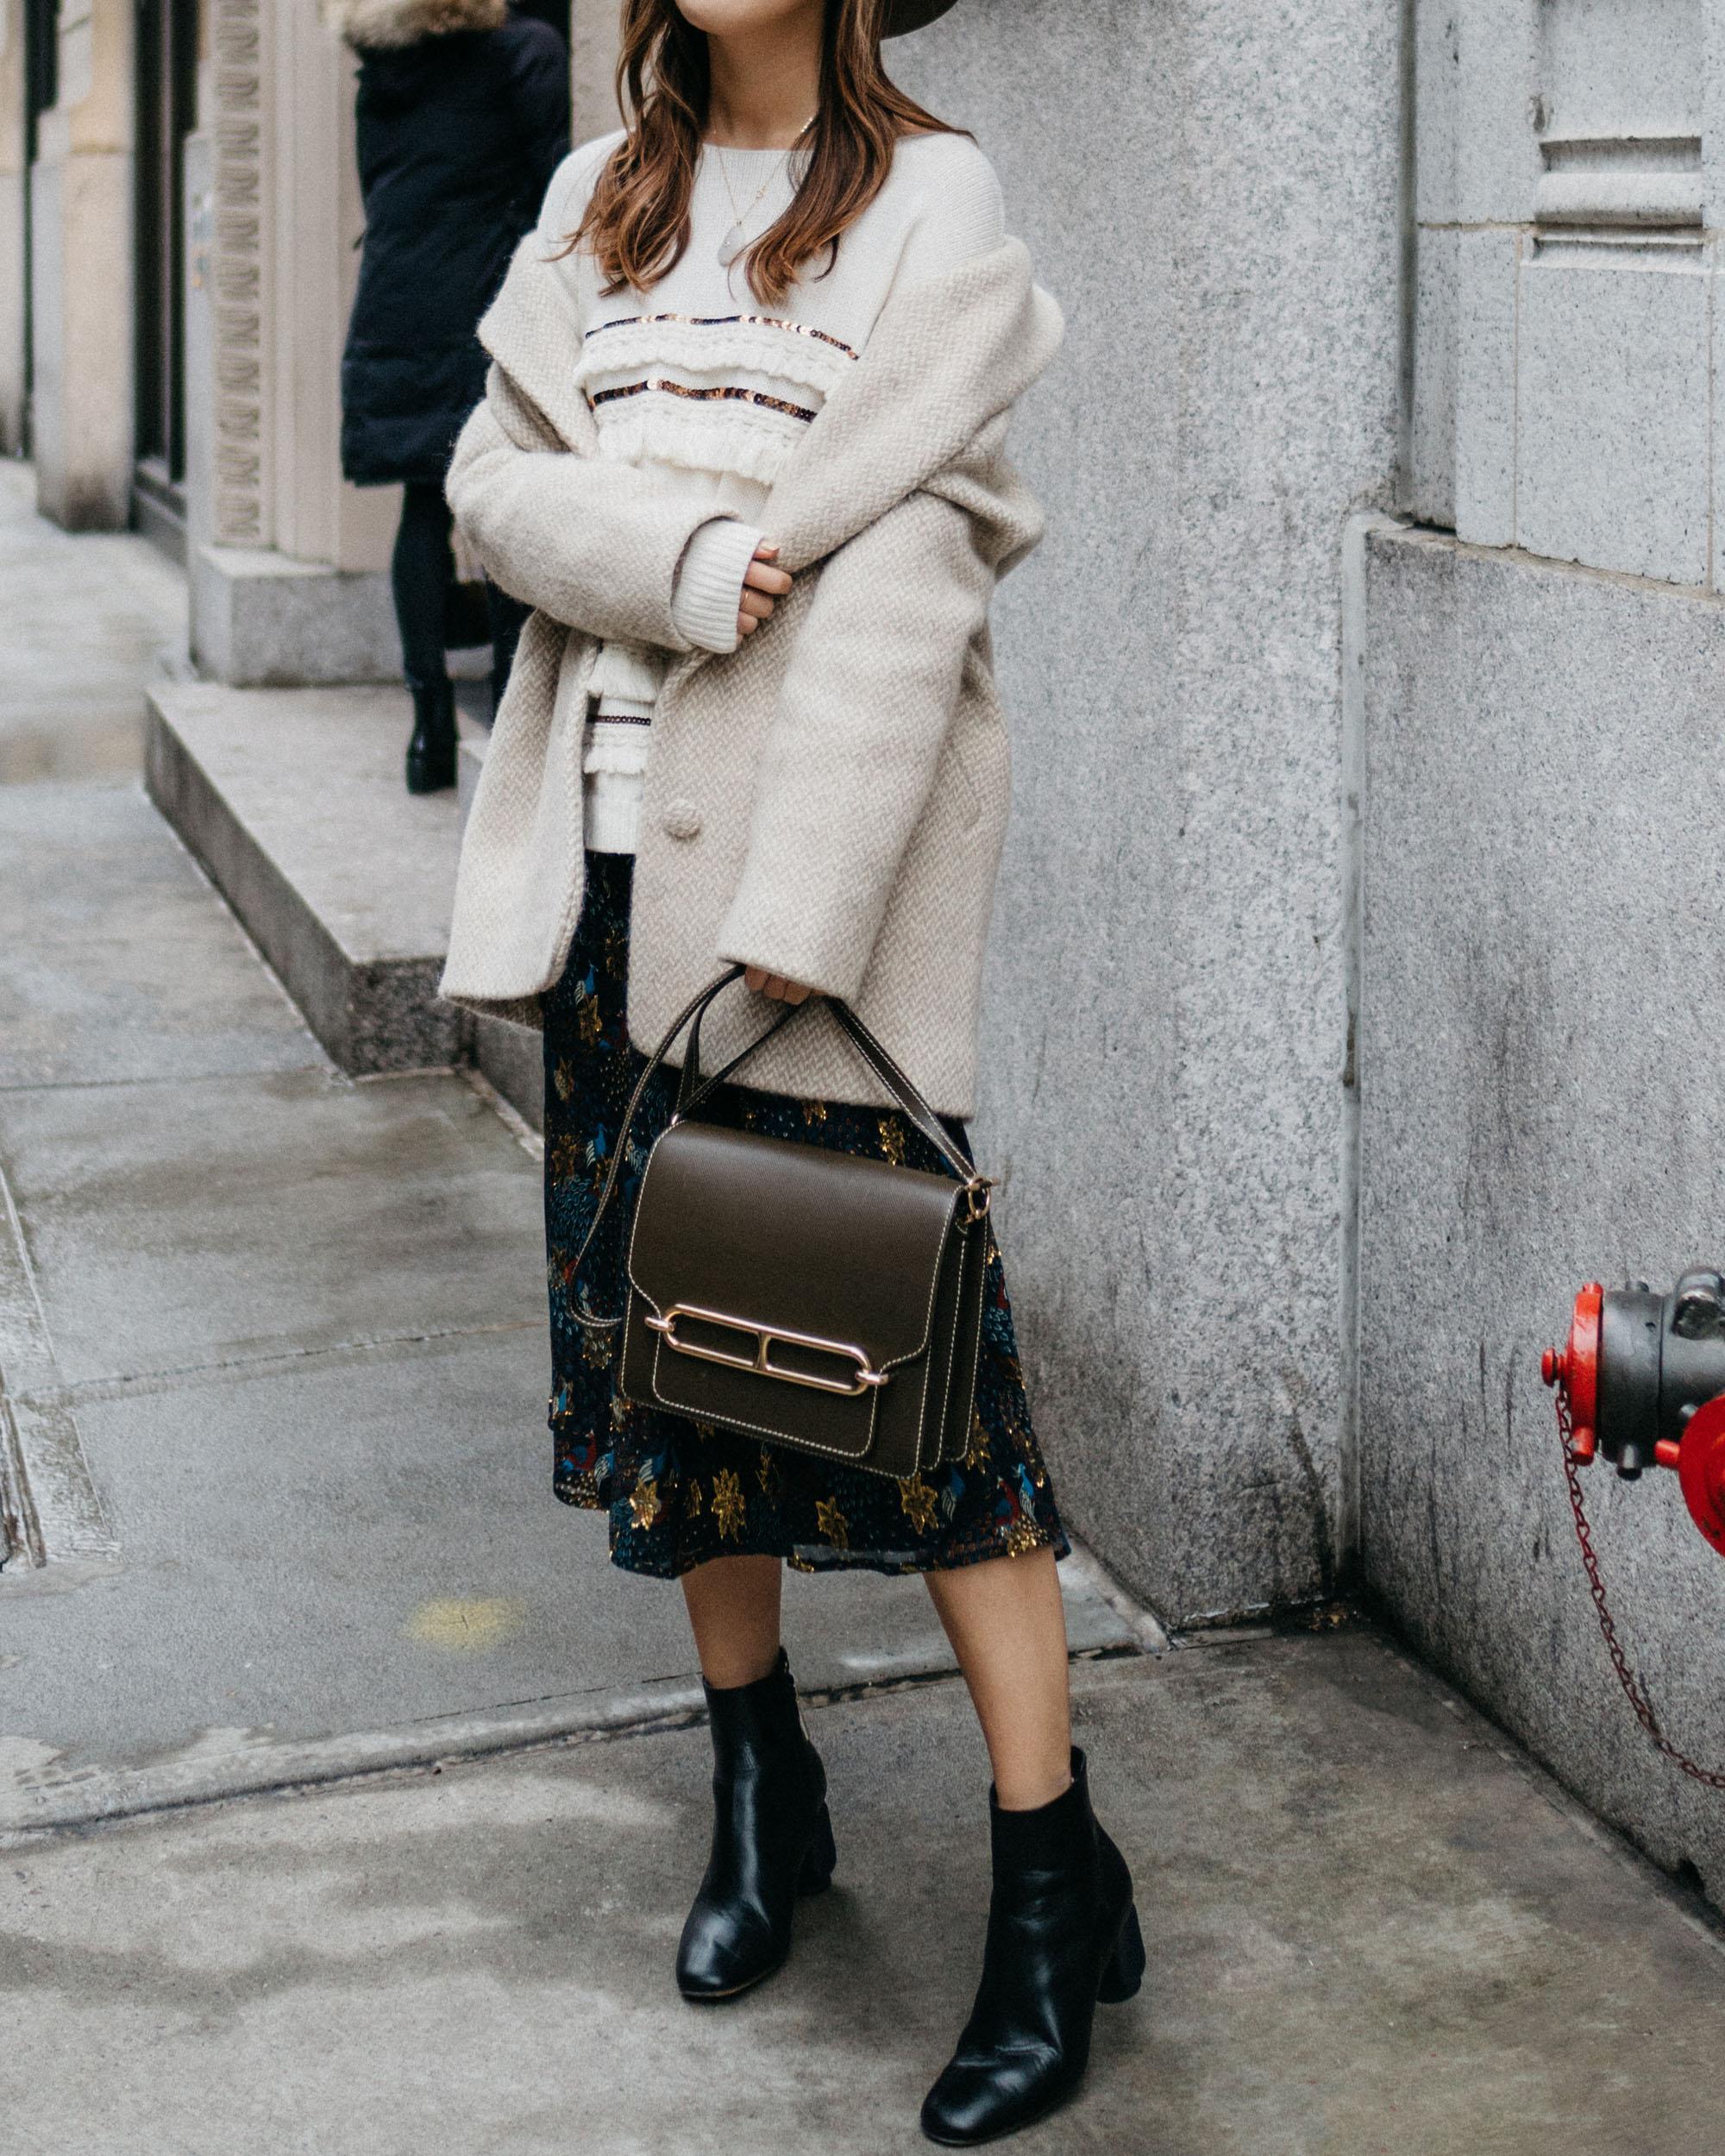 Sézane Coat ,  Sézane Sweate r,  Sézane Skirt , Hermes Bag, The Row Boots